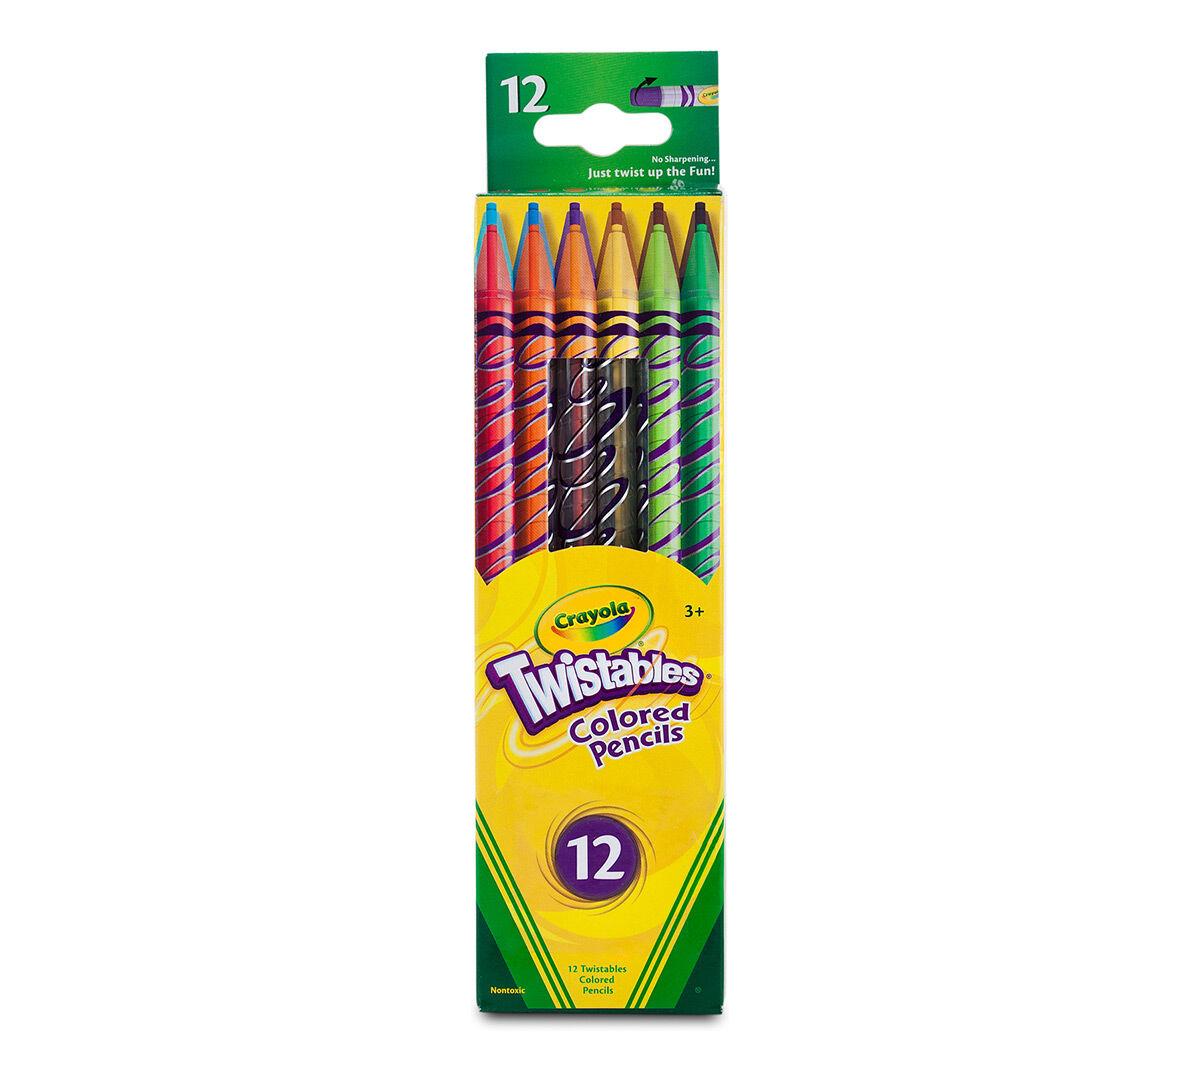 Crayola Twistables Colored Pencils Always Sharp Art Tools 12